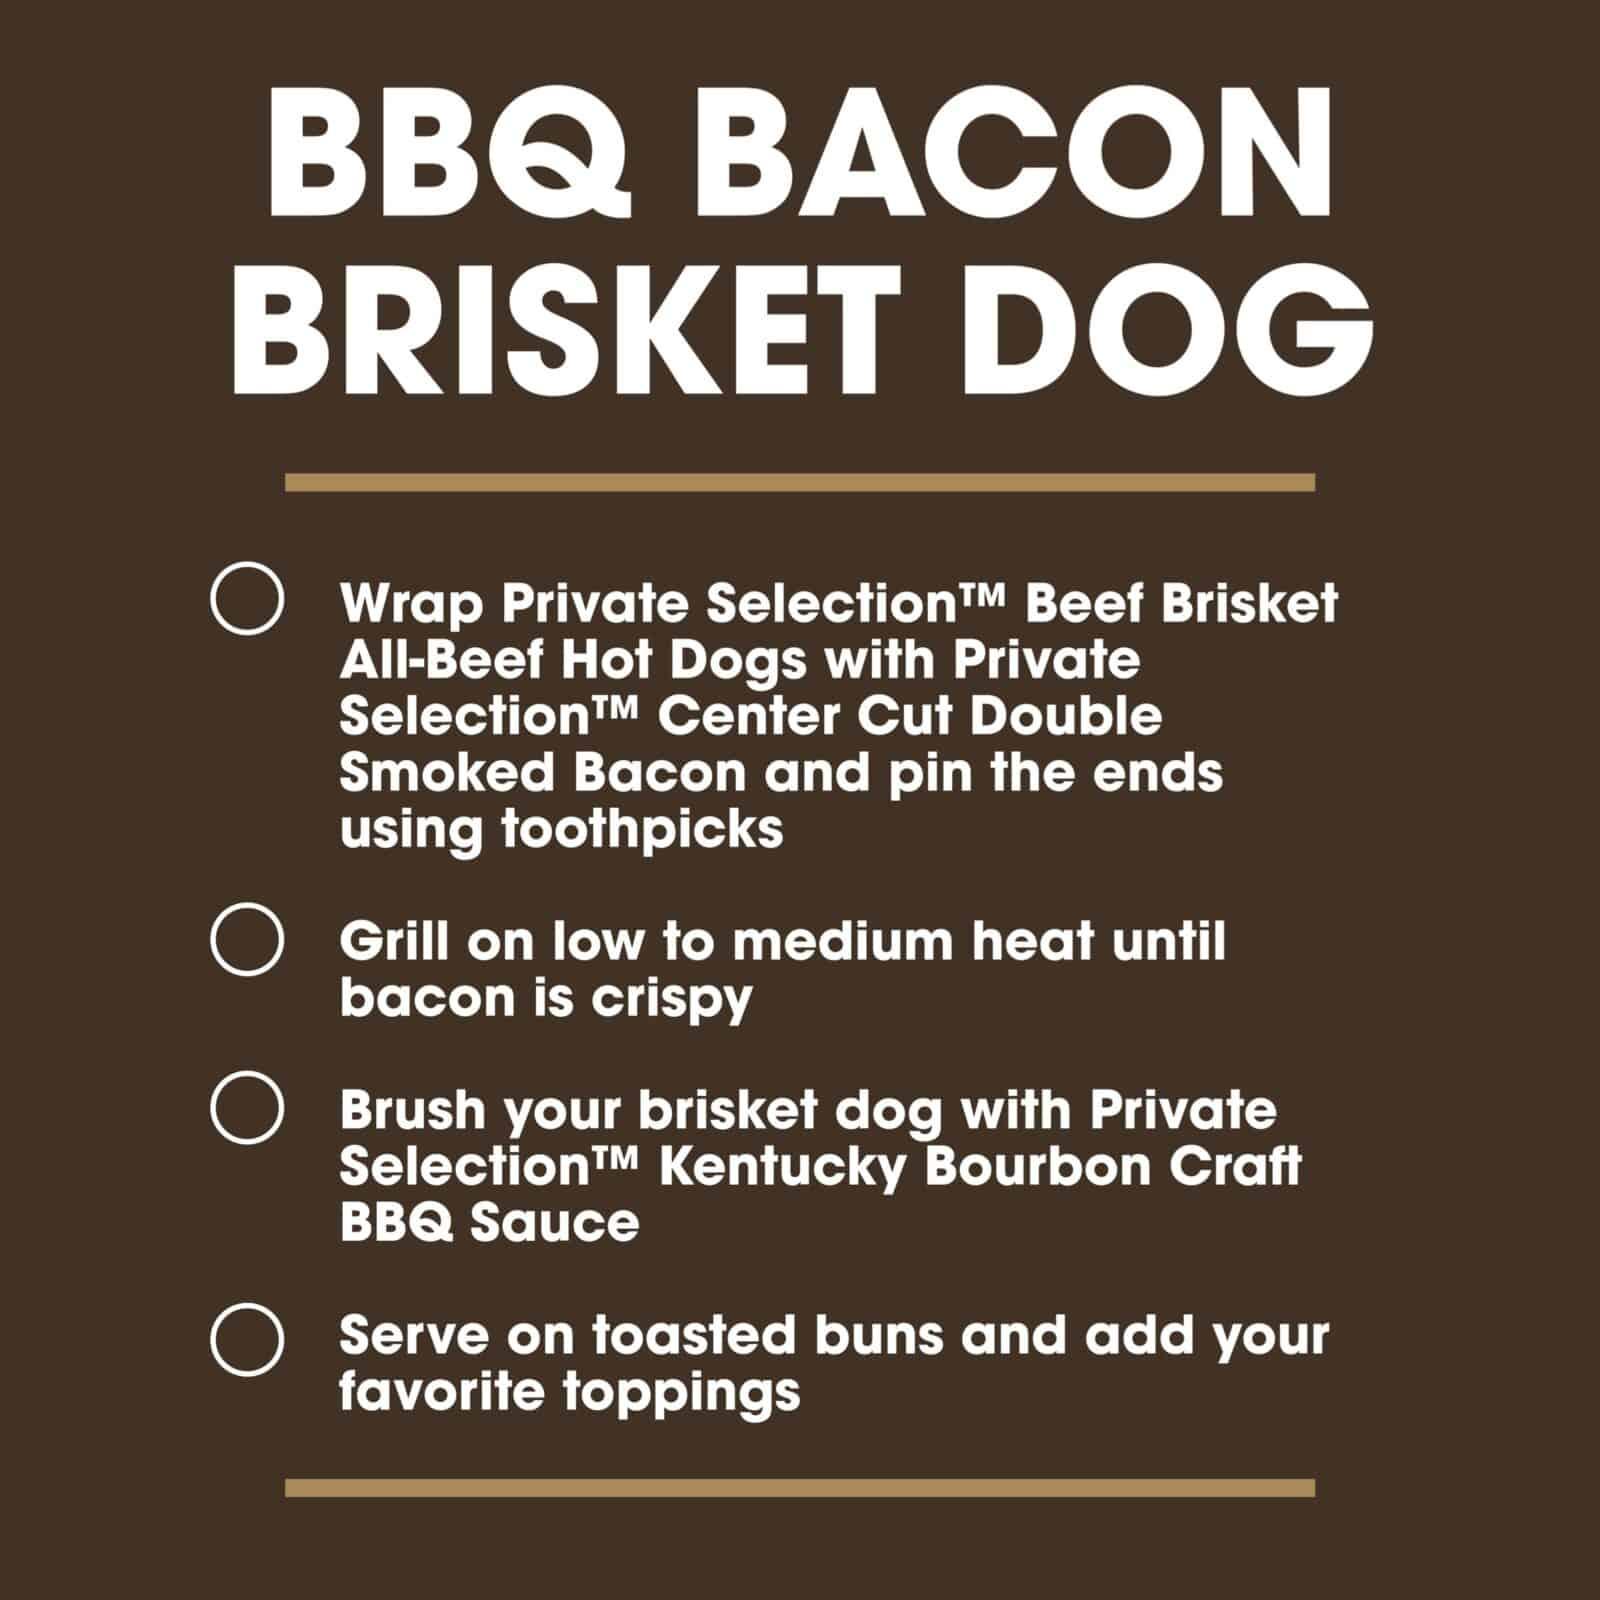 BBQ Bacon Brisket Dog